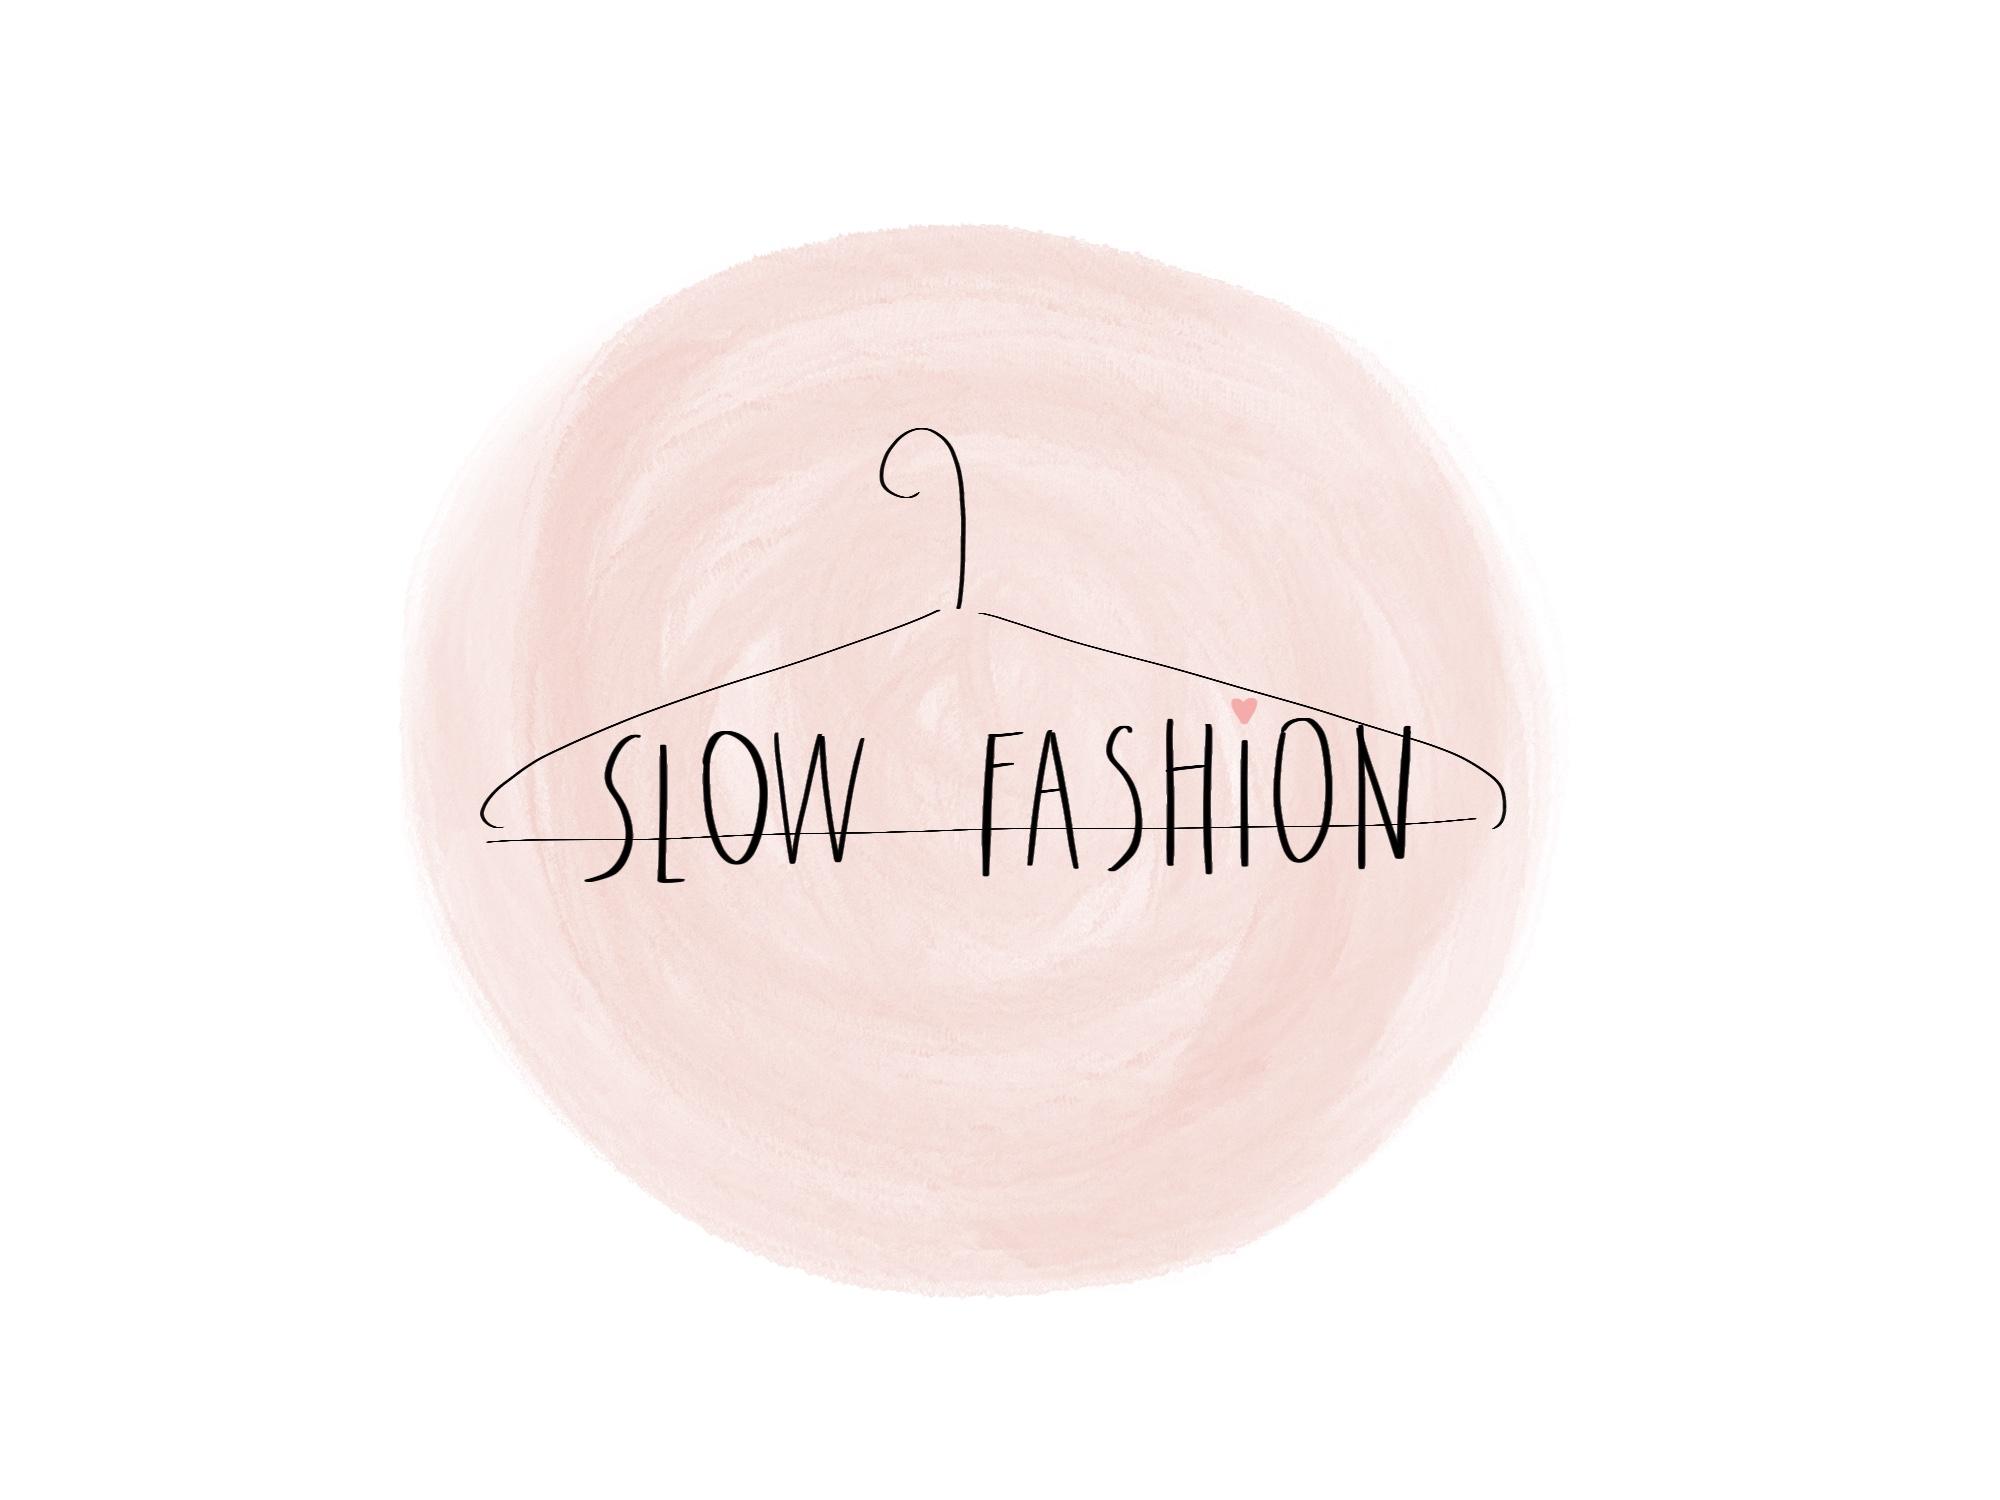 #slowfashion